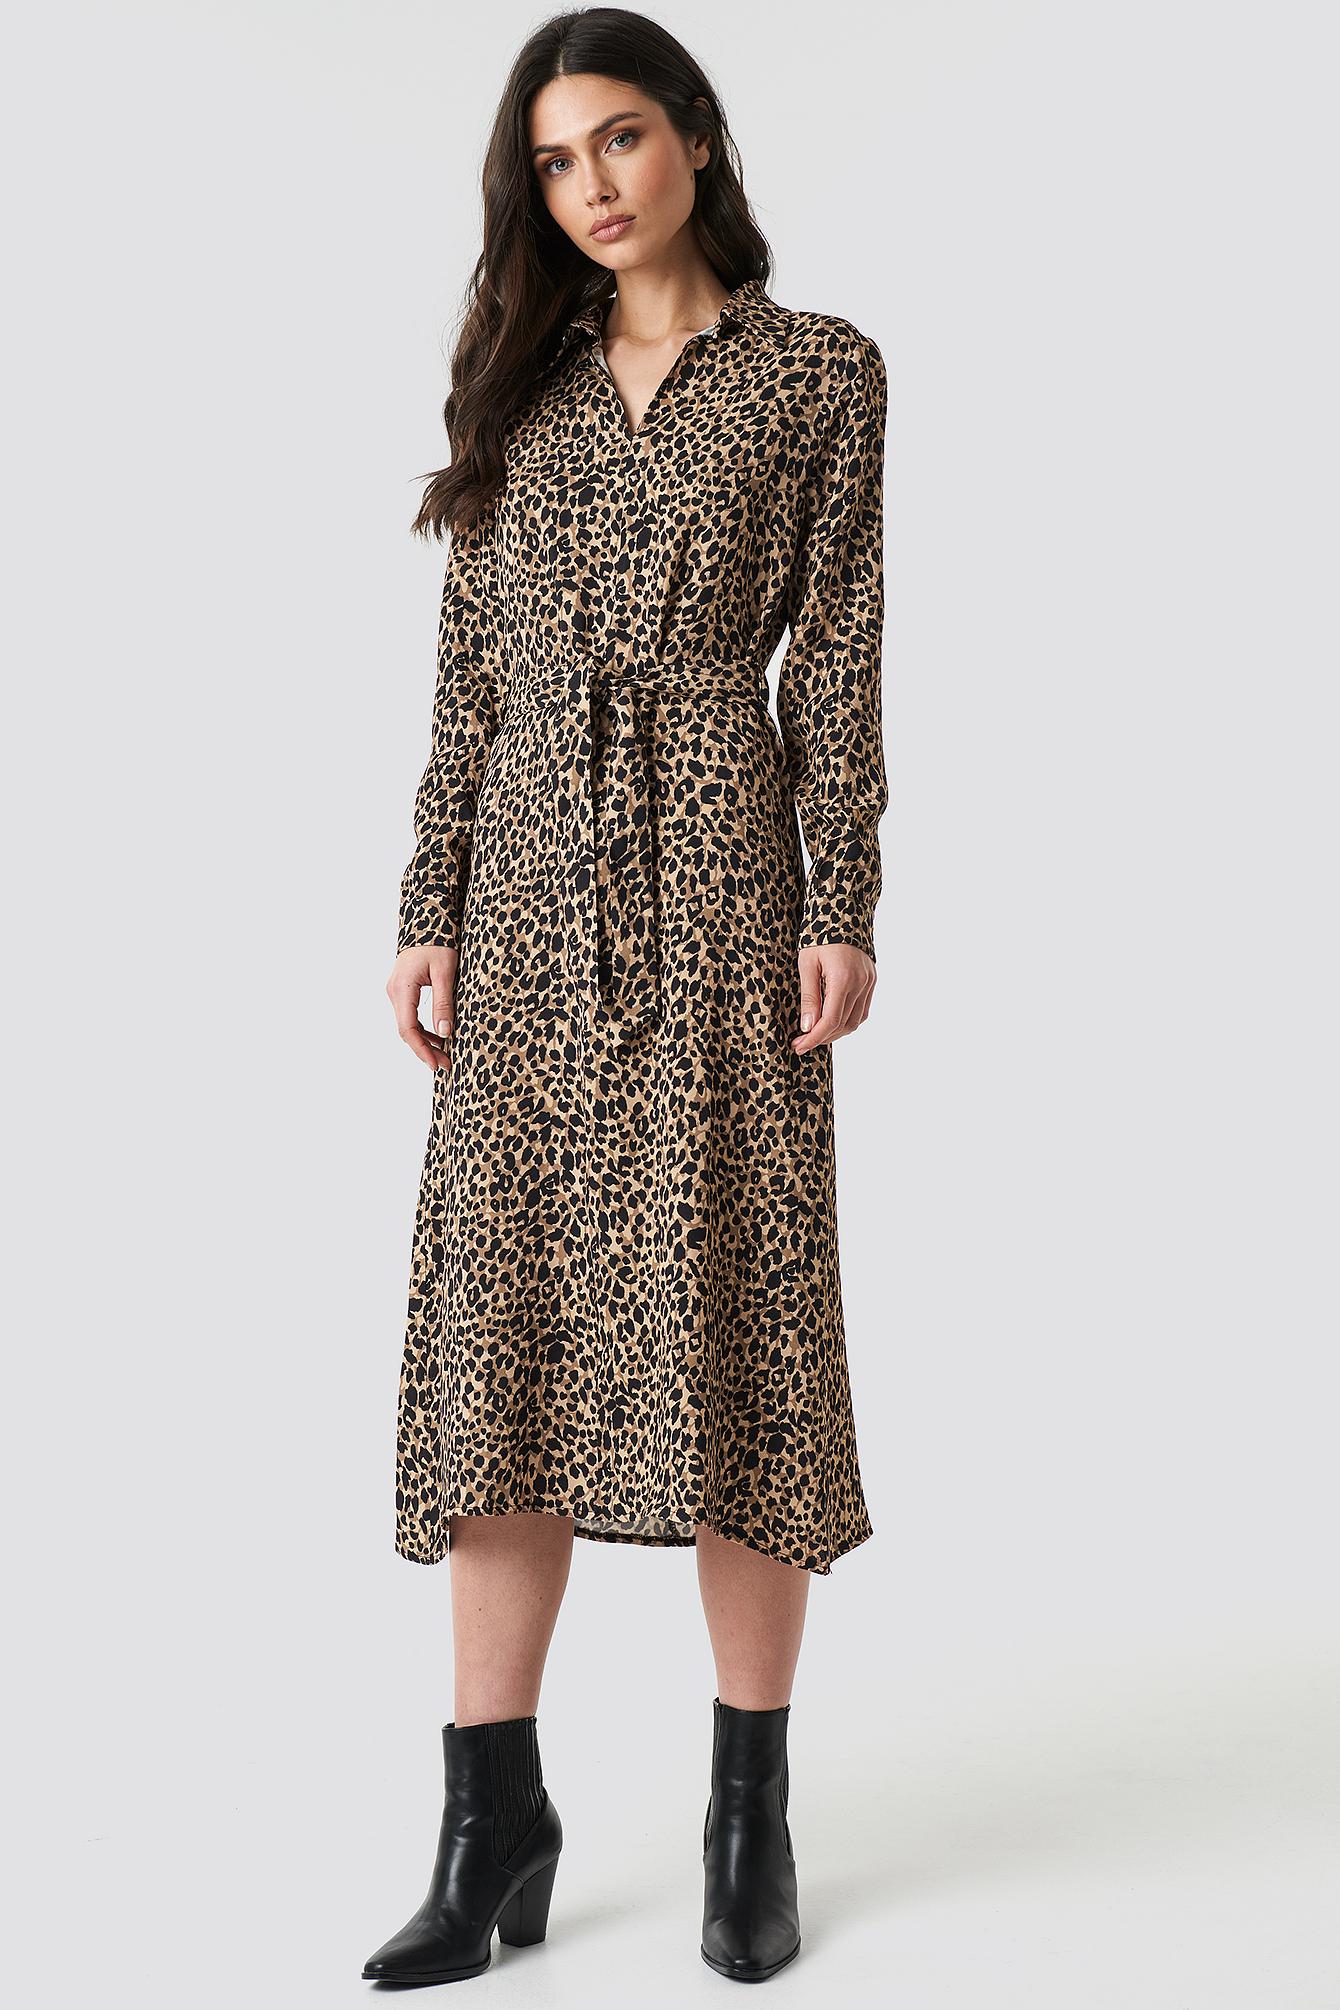 5c1b6e56c303 Leopard Patterned Midi Dress Multicolor